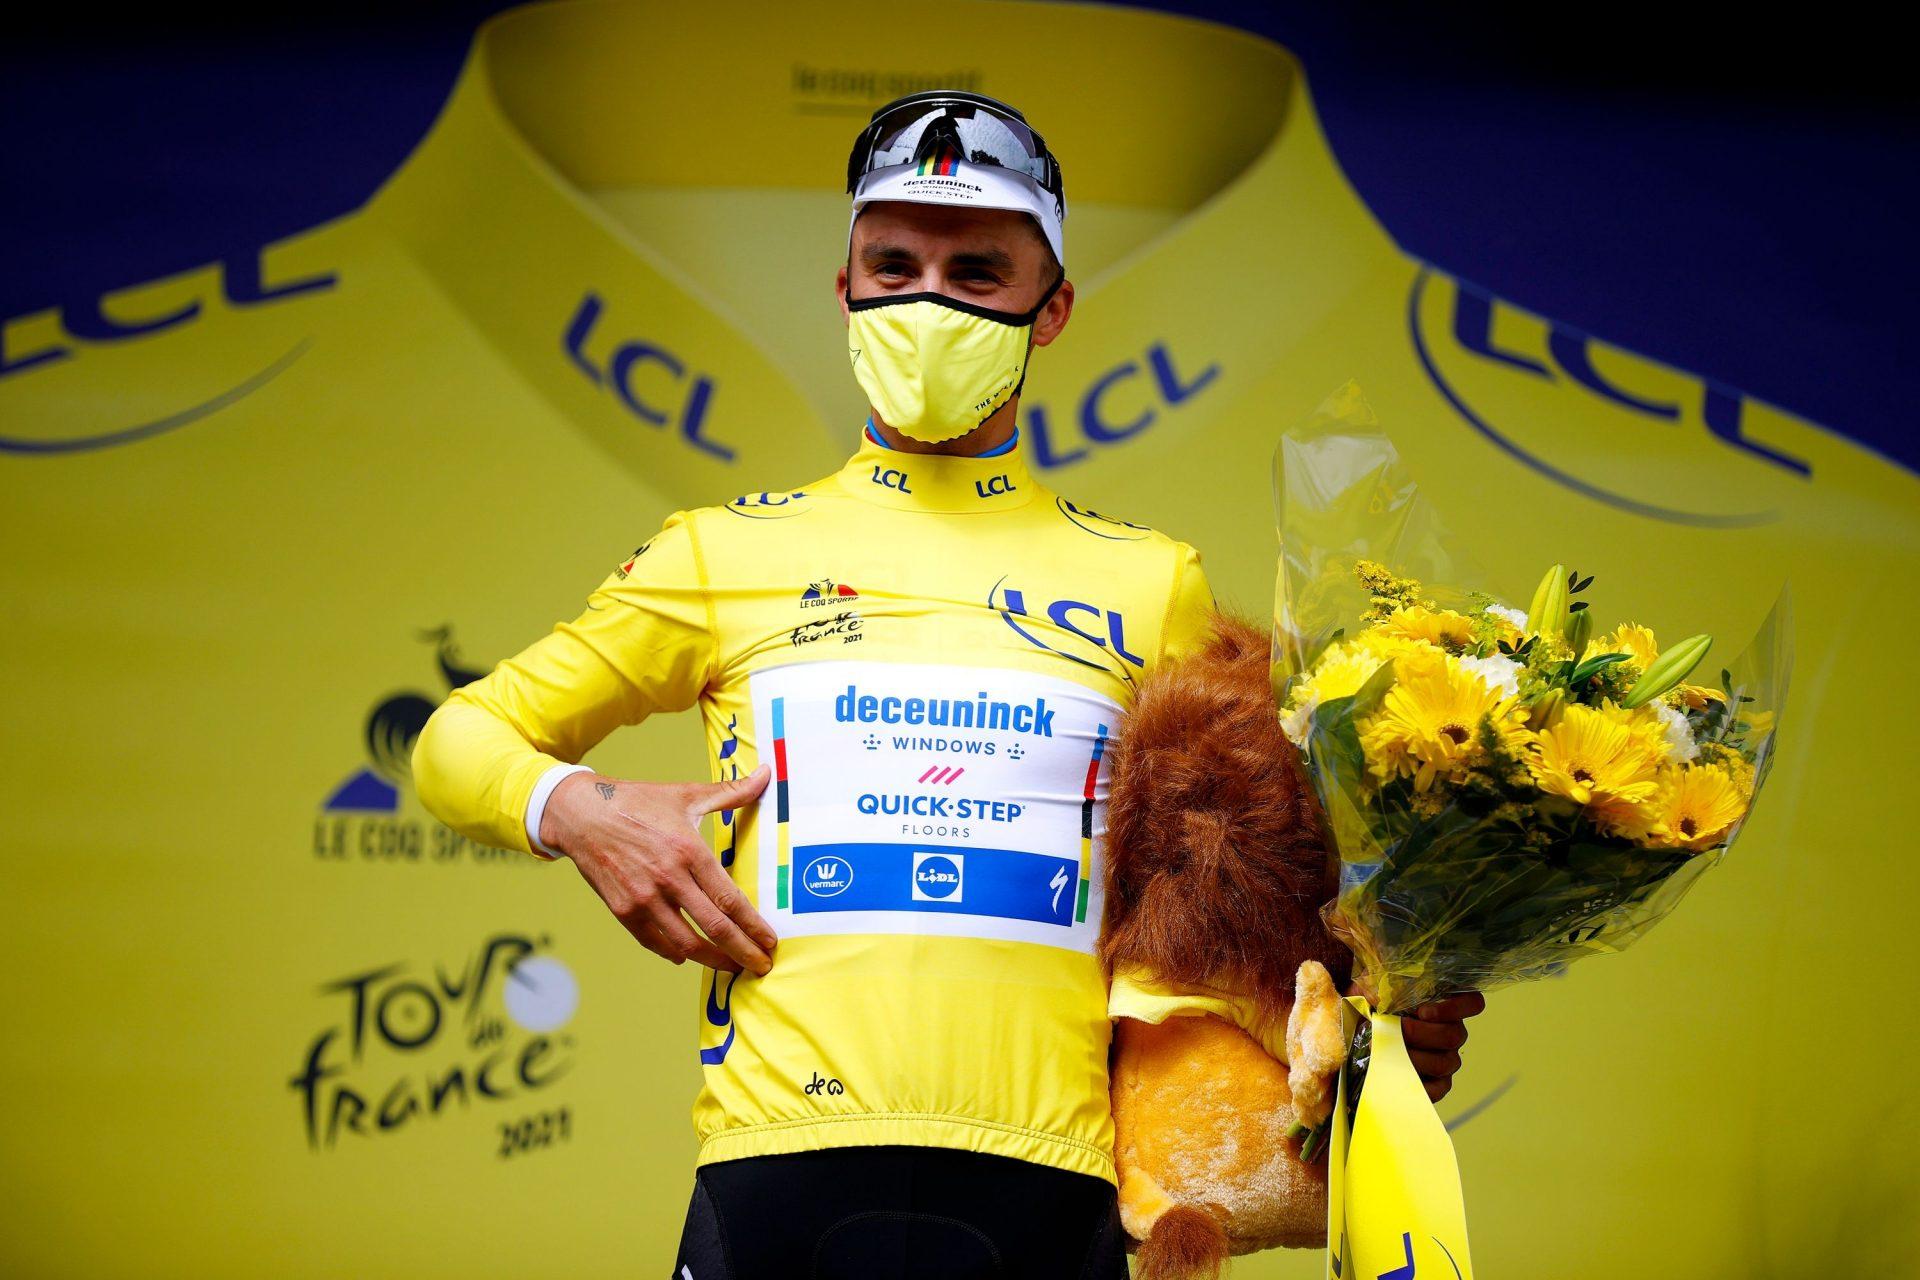 Tour de France, žlutý dres a tradiční maskot?